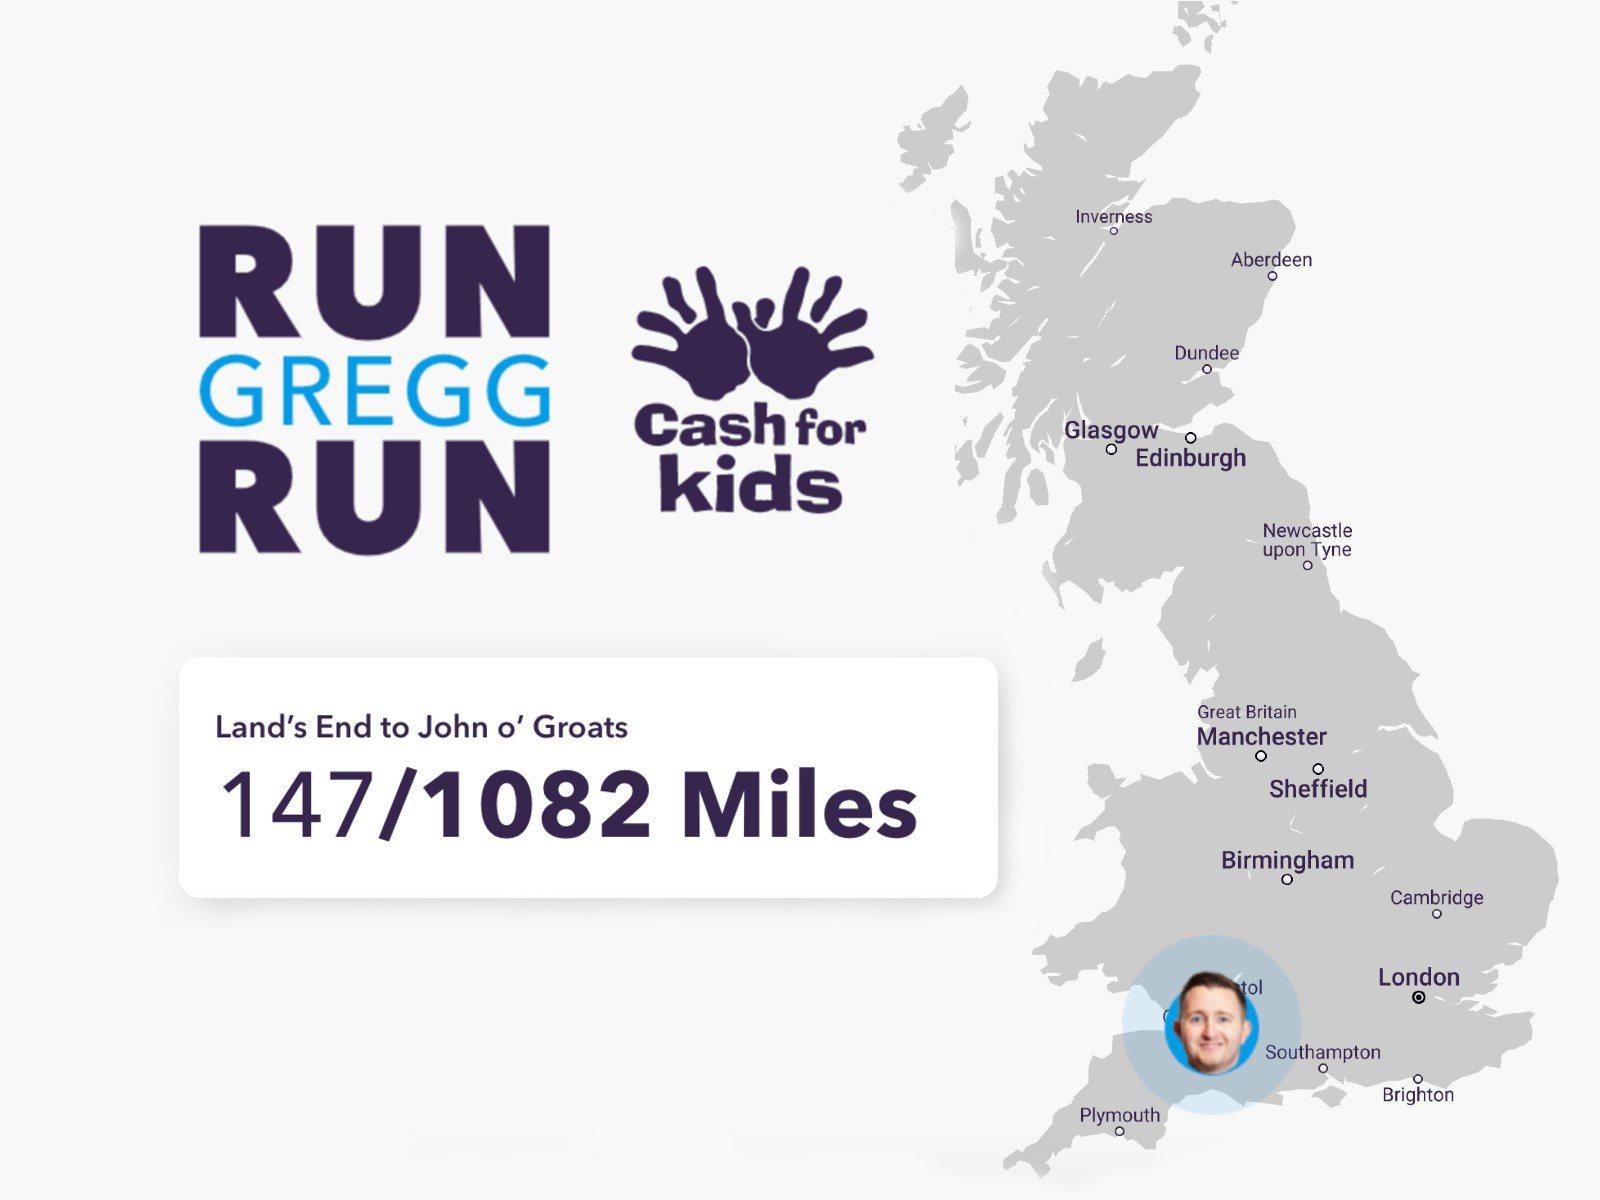 Run Gregg Run! Running the Length of the UK To Fundraise for Cash for Kids